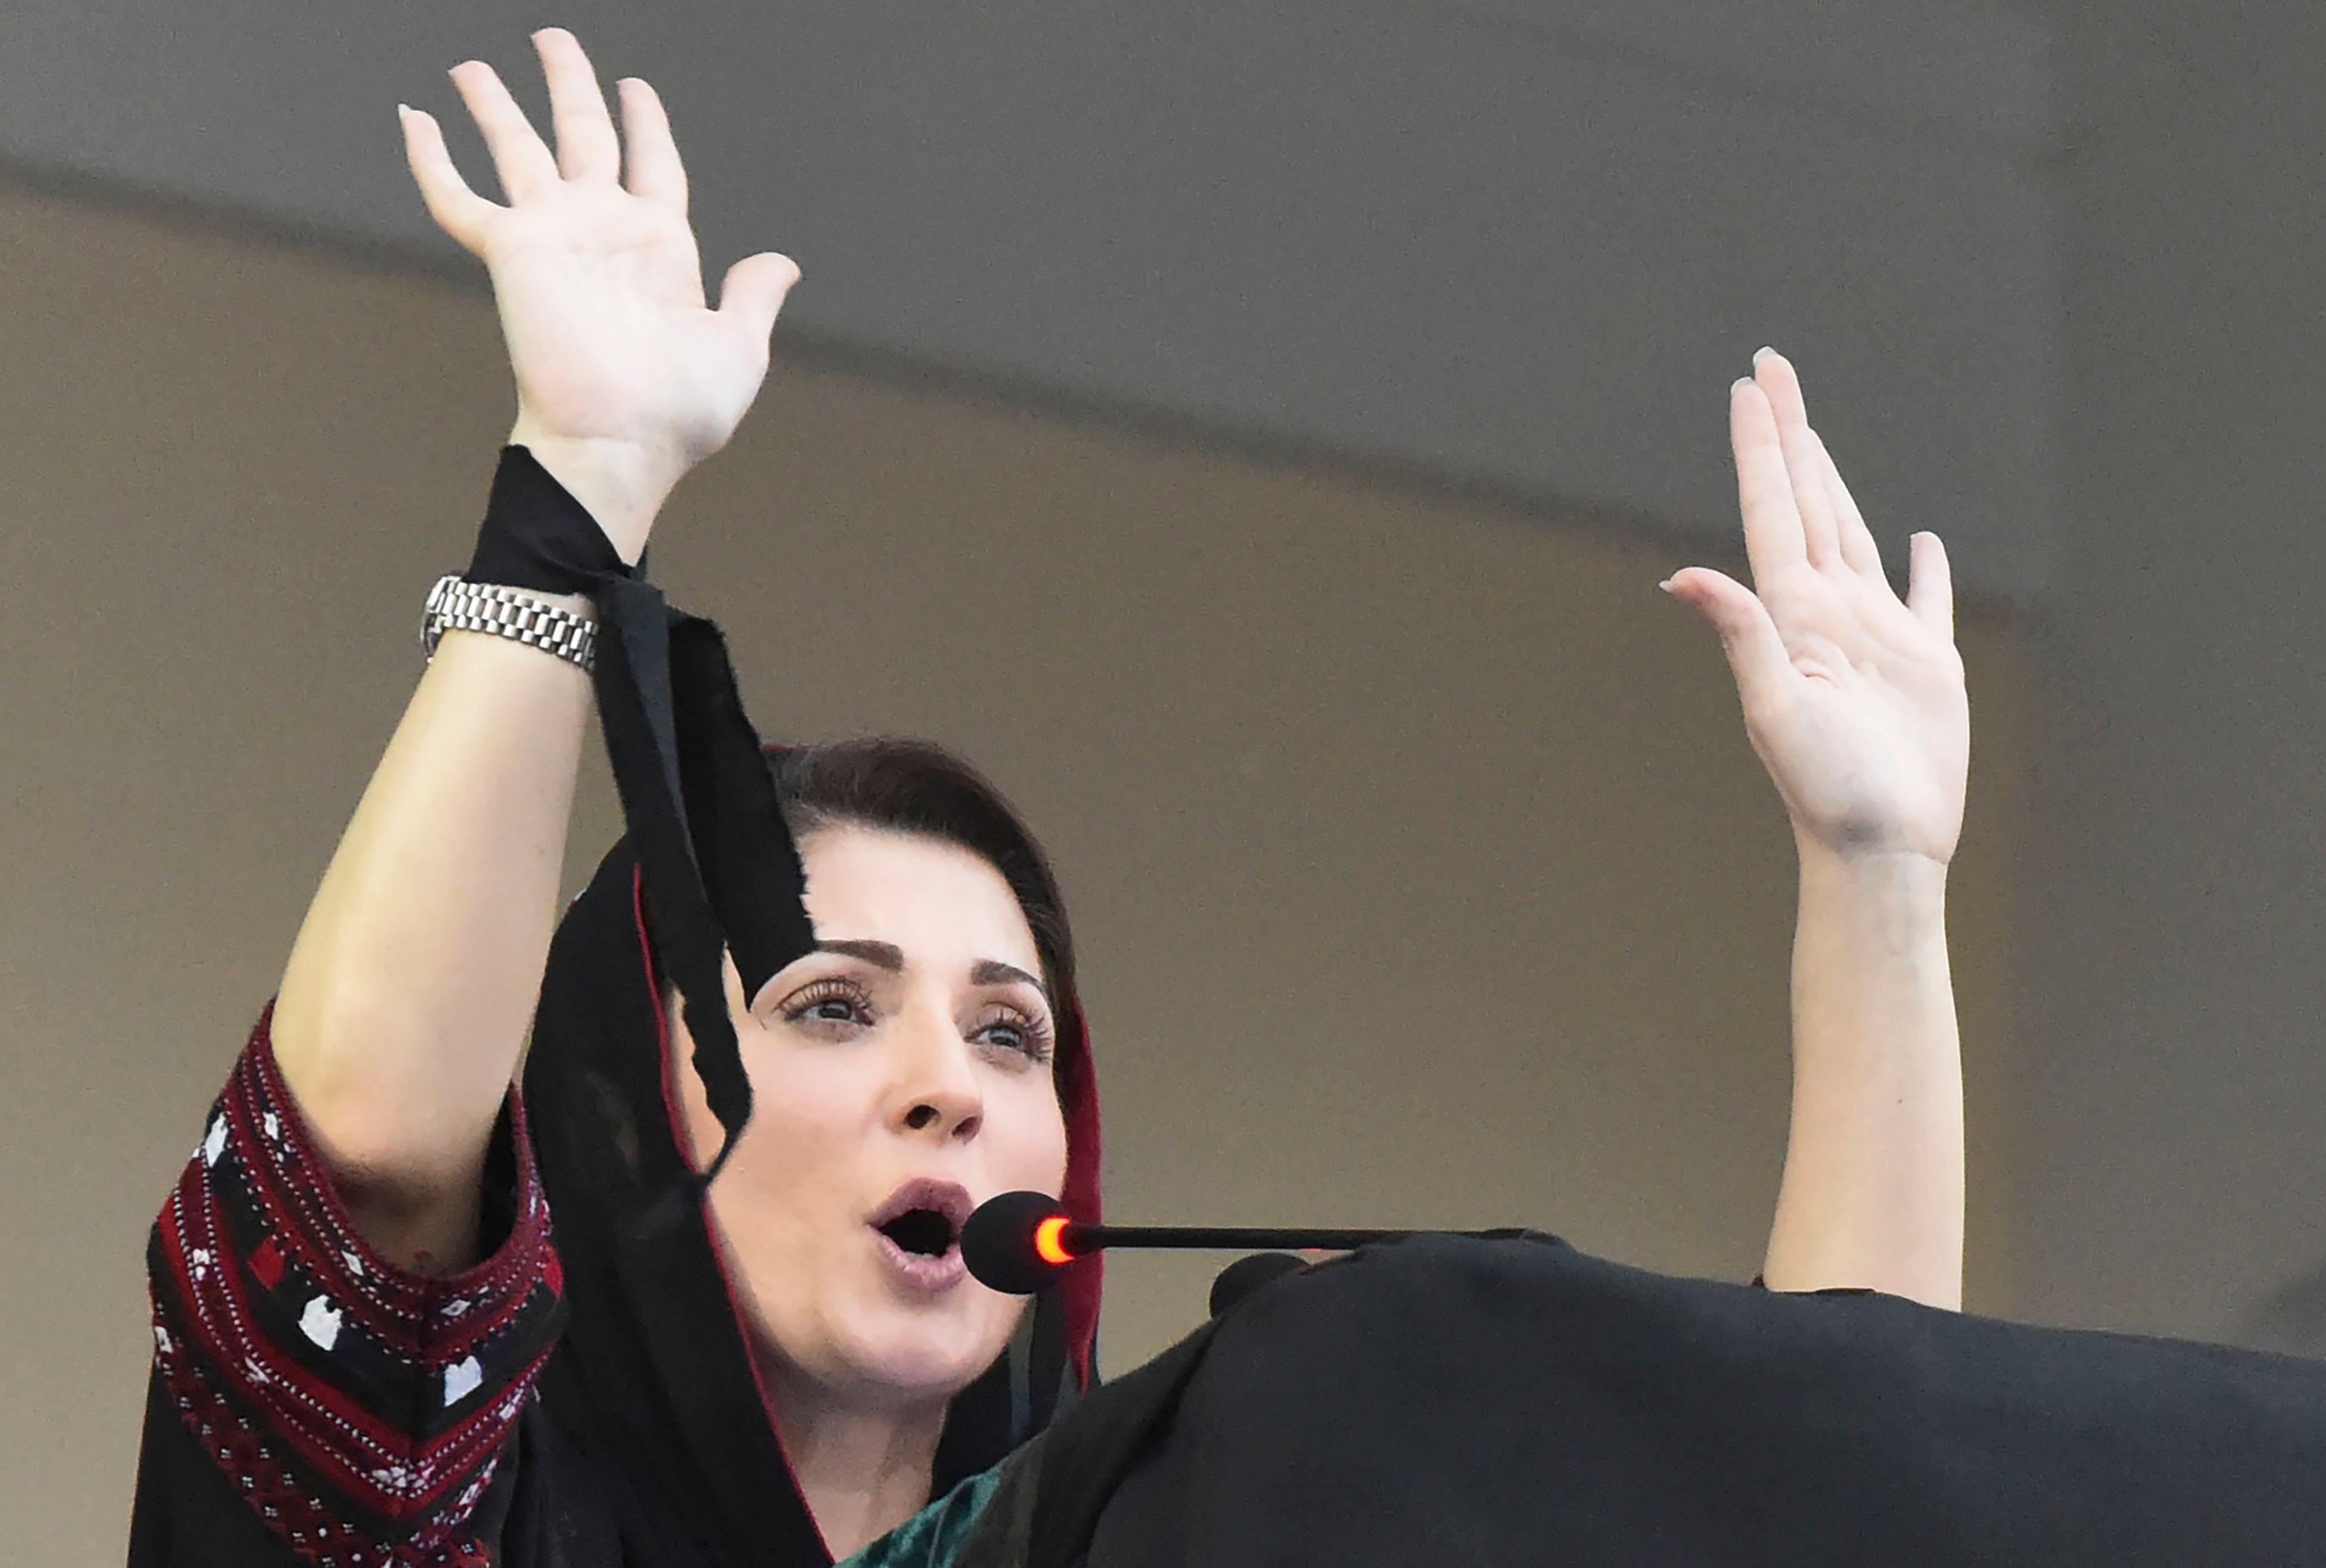 PML-N Vice President Maryam Nawaz. PHOTO: AFP